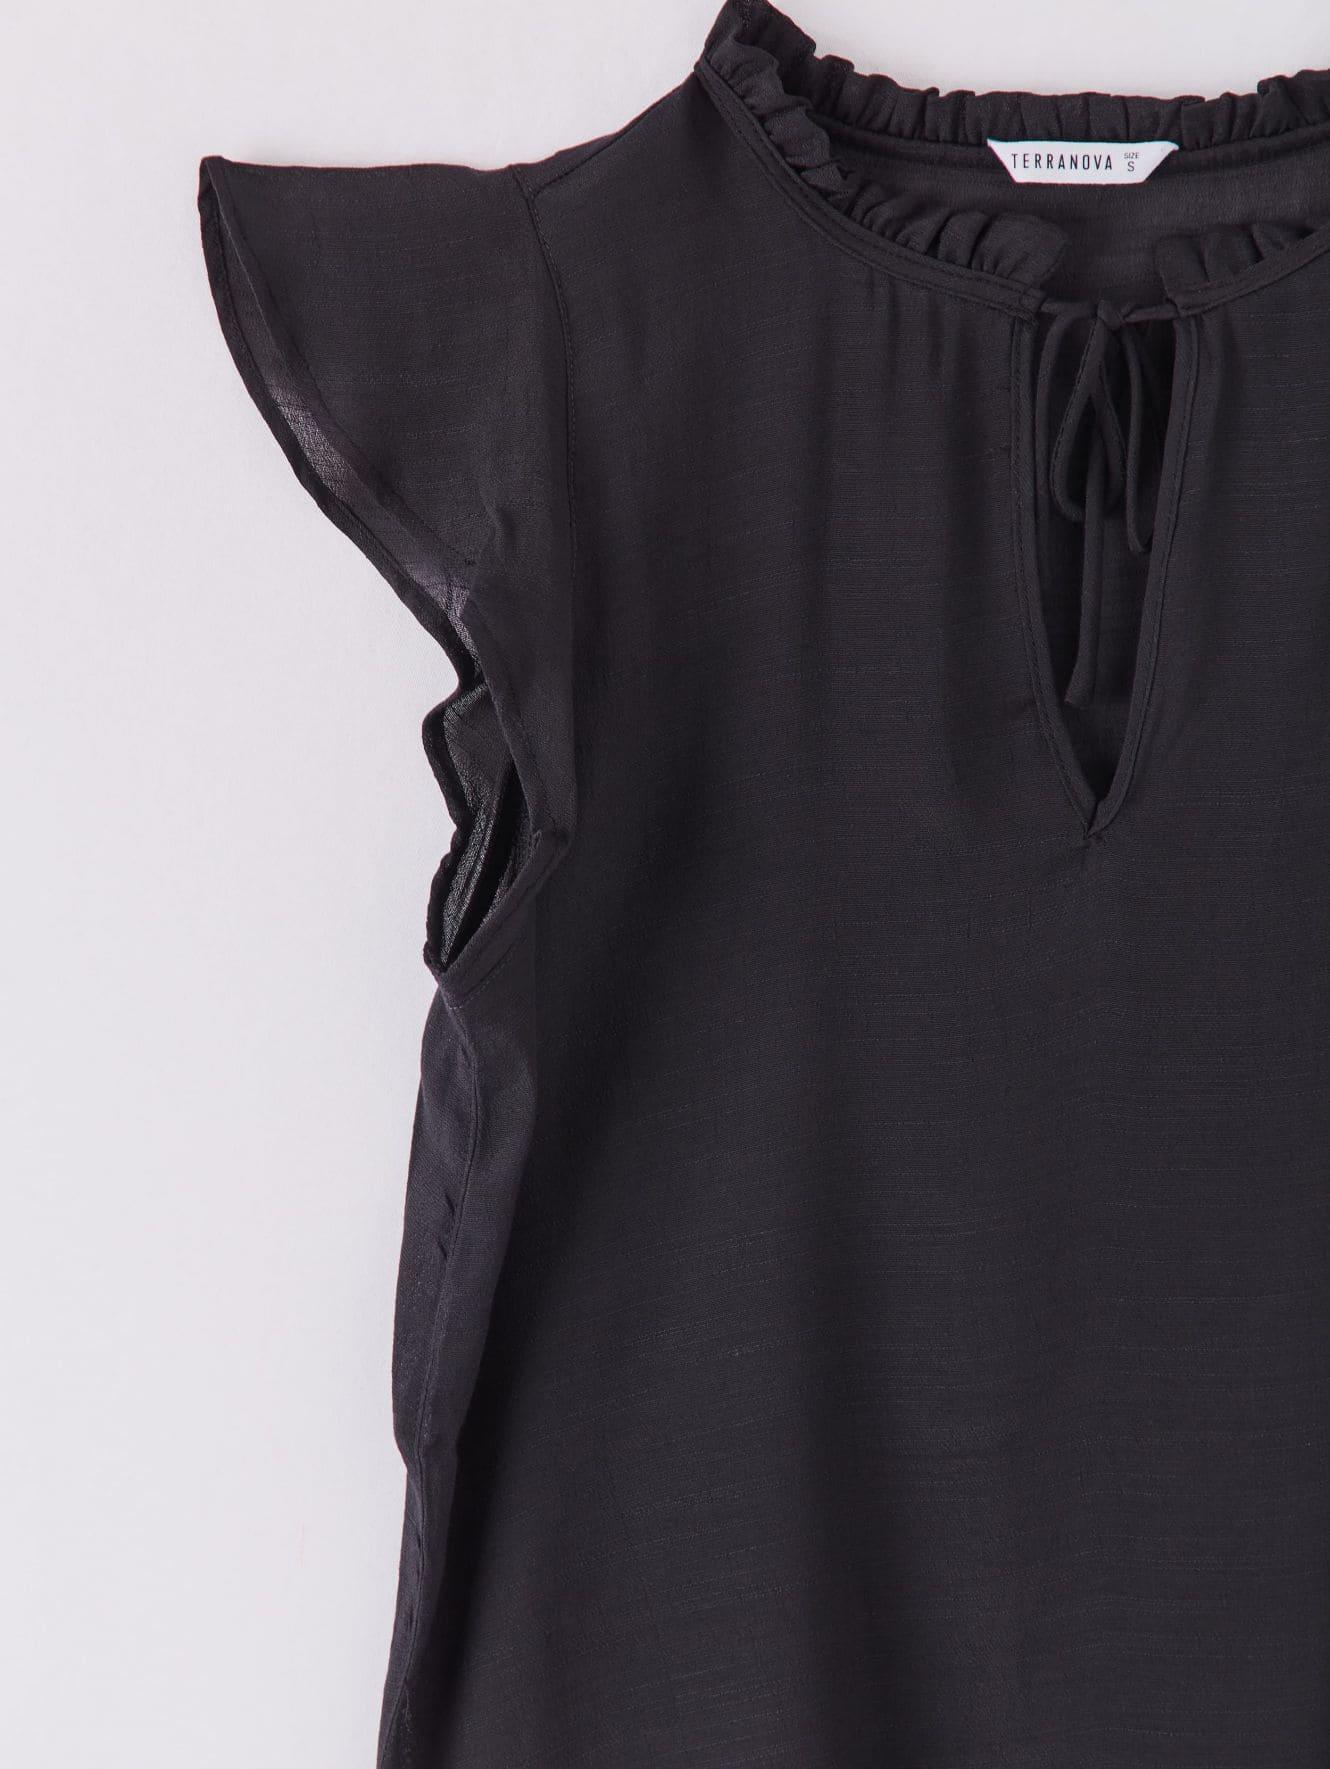 Short-sleeved shirt Woman Terranova